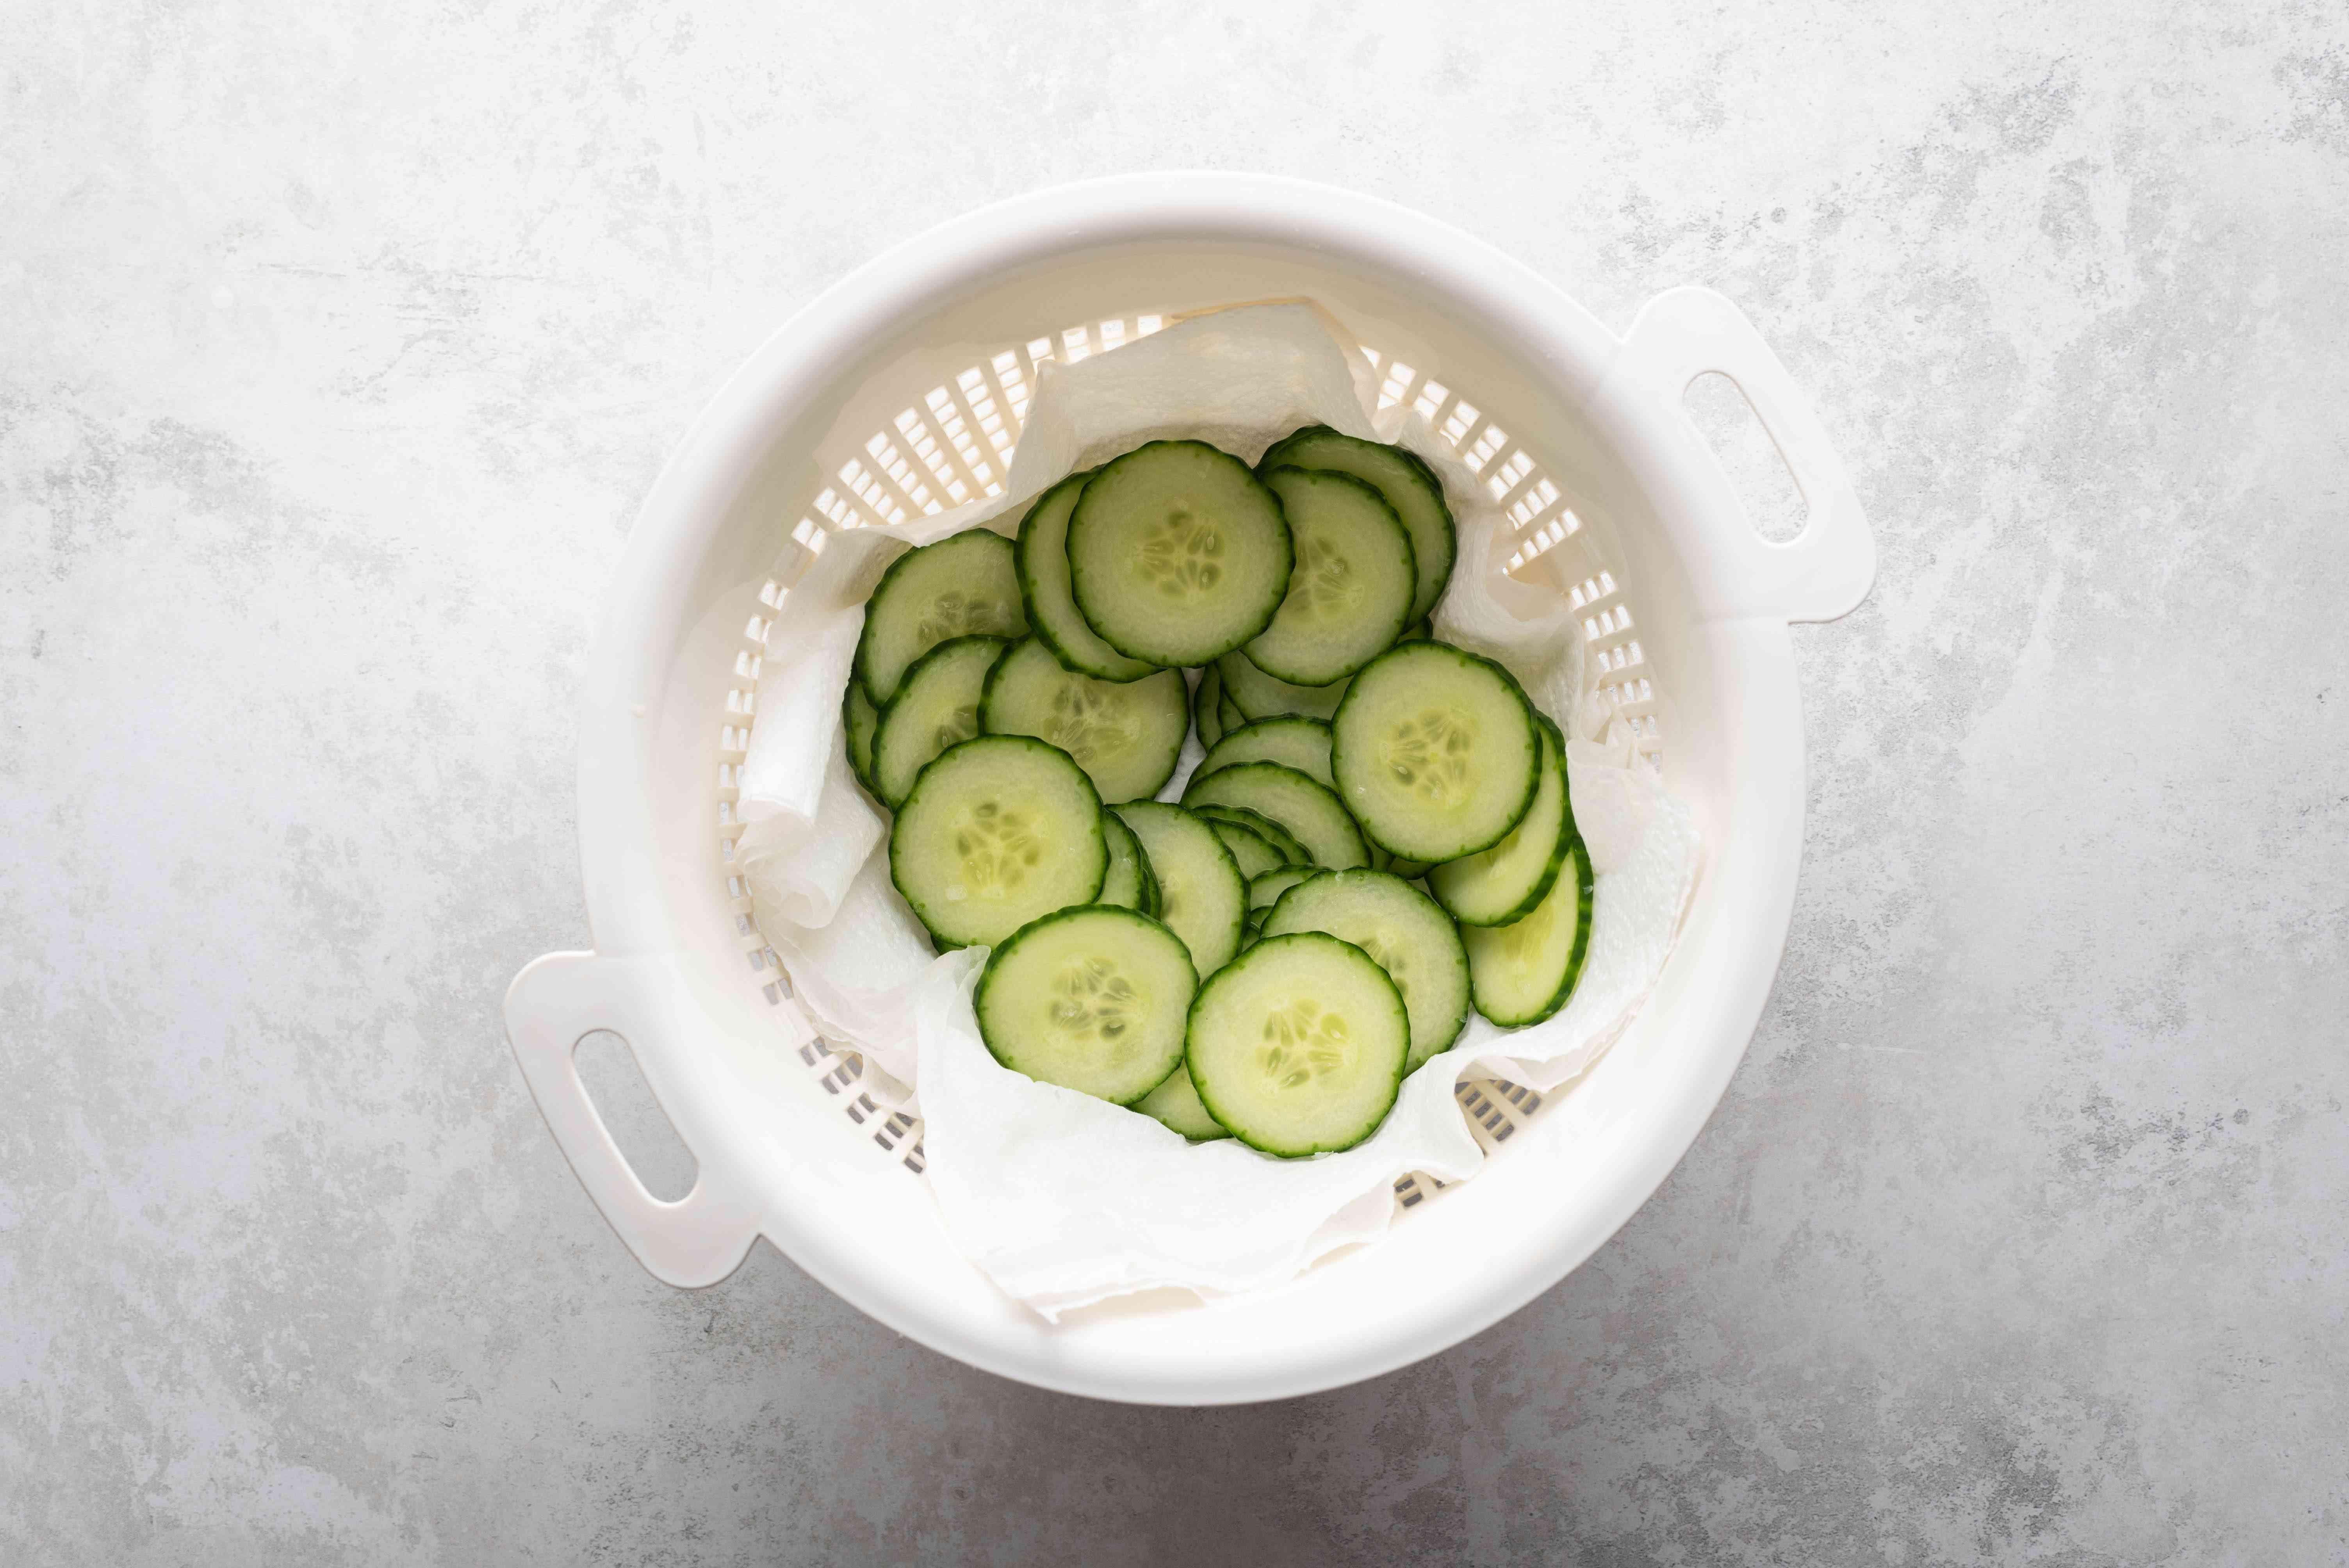 cucumber slices in a colander